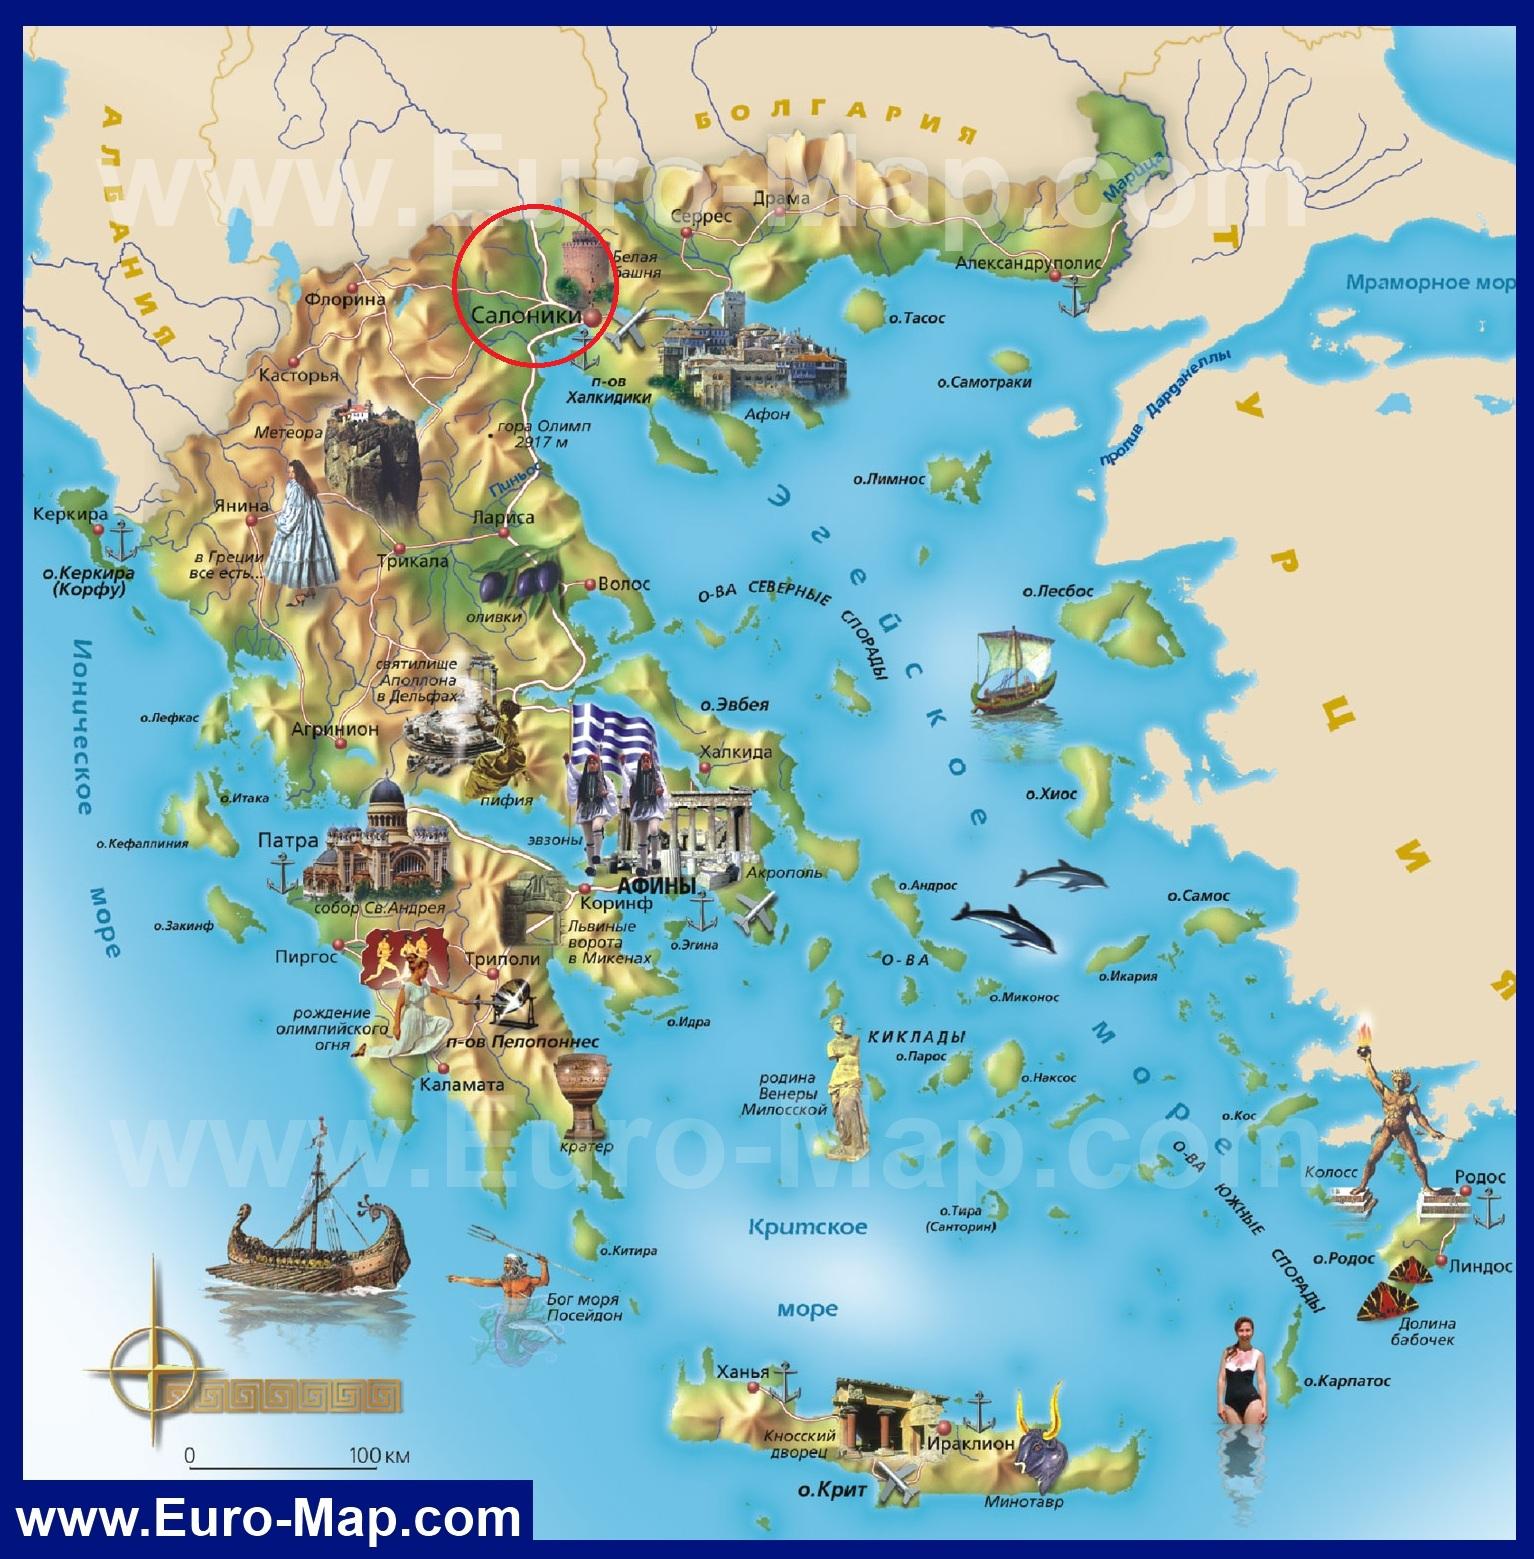 turisticheskaya-karta-grecii-s-kurortami